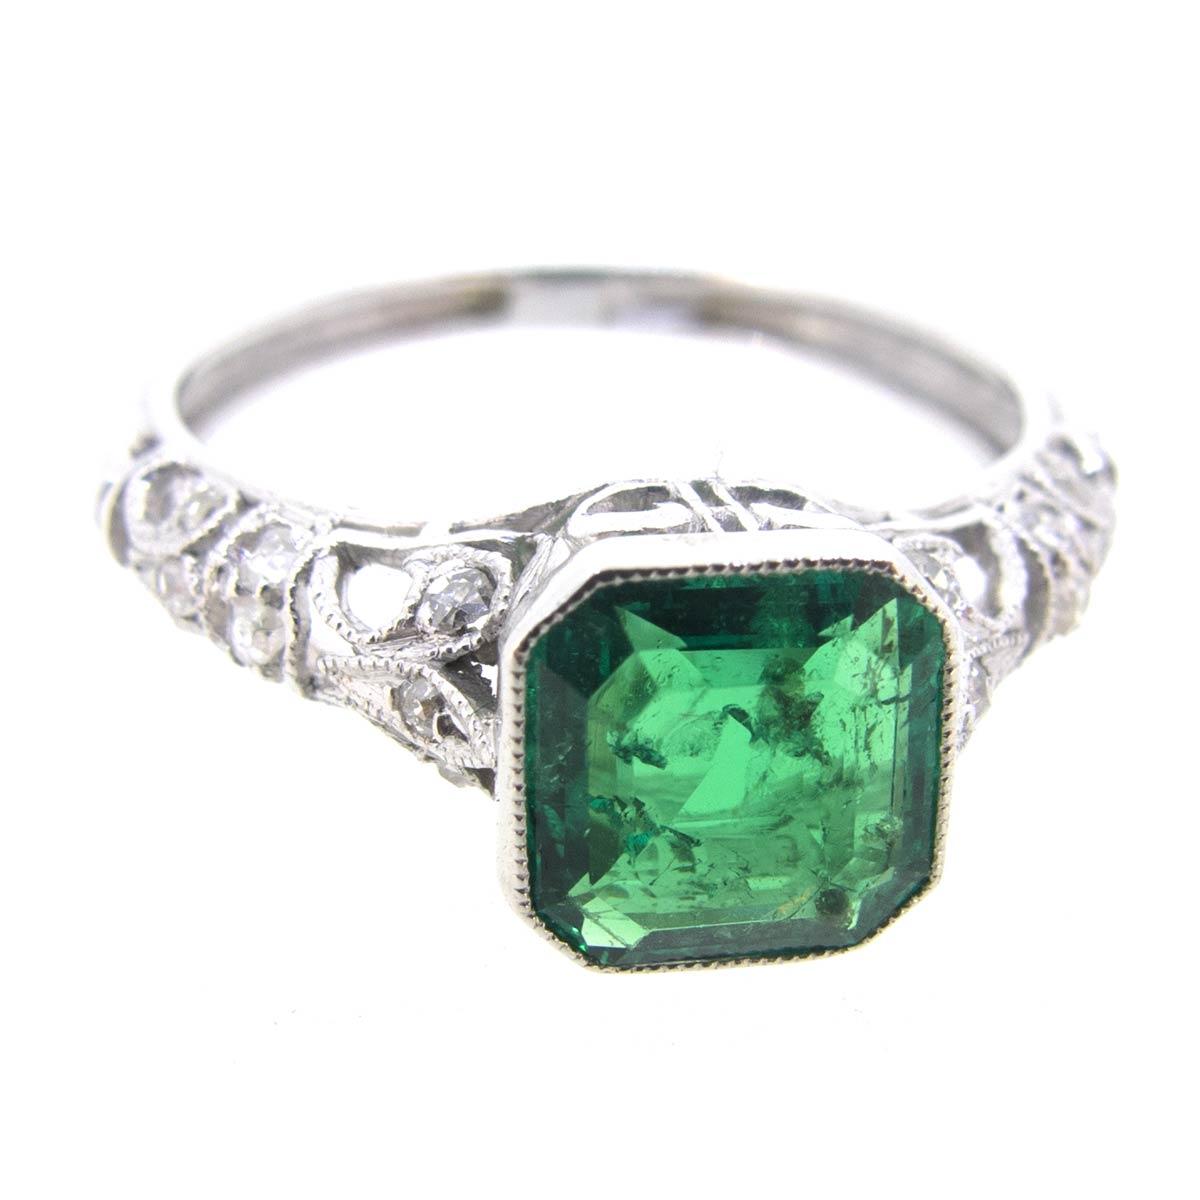 Emerald & Diamond Filigree Ring